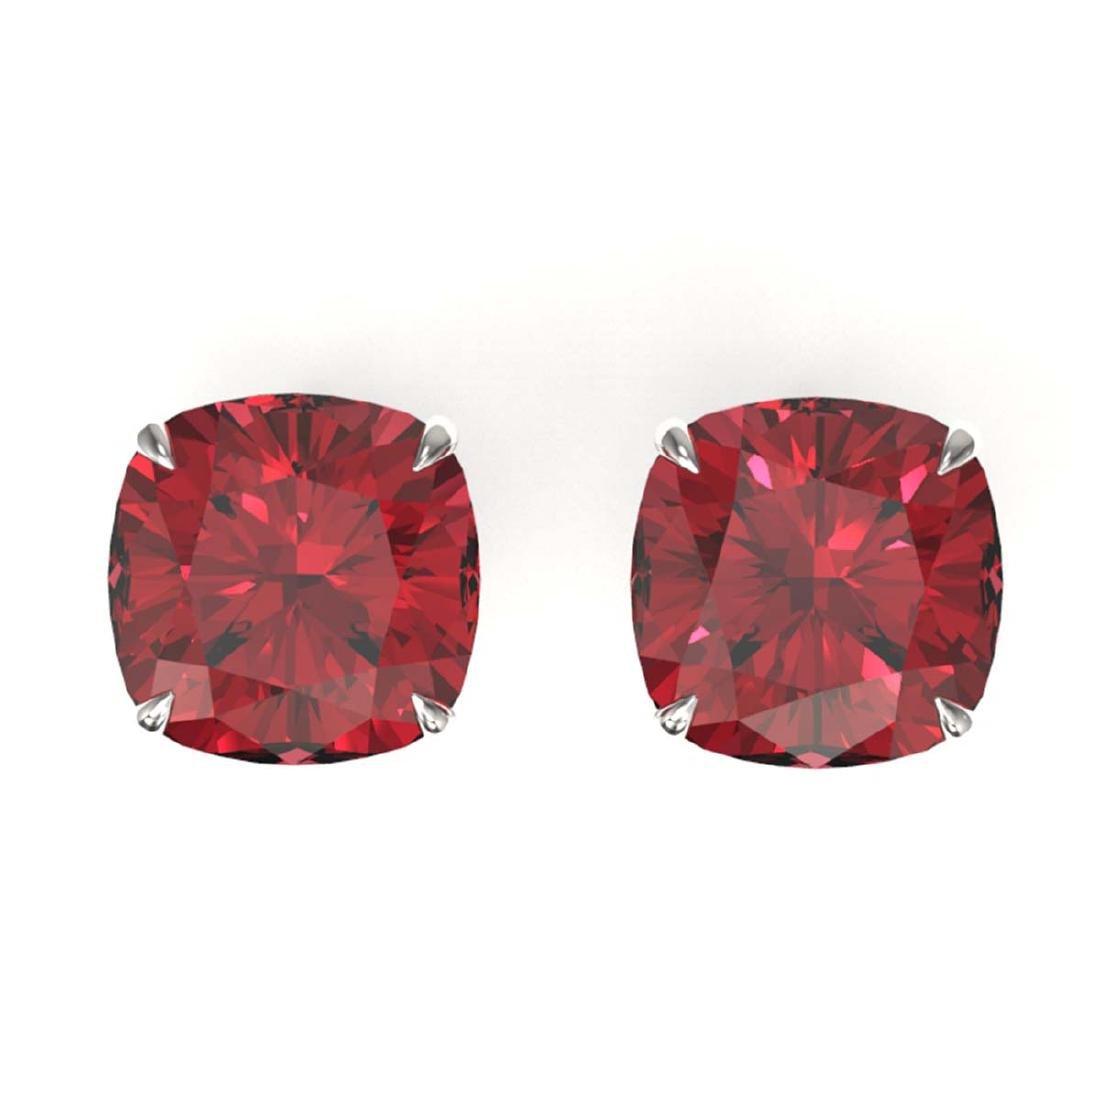 8 ctw Cushion Cut Pink Tourmaline Stud Earrings 18K